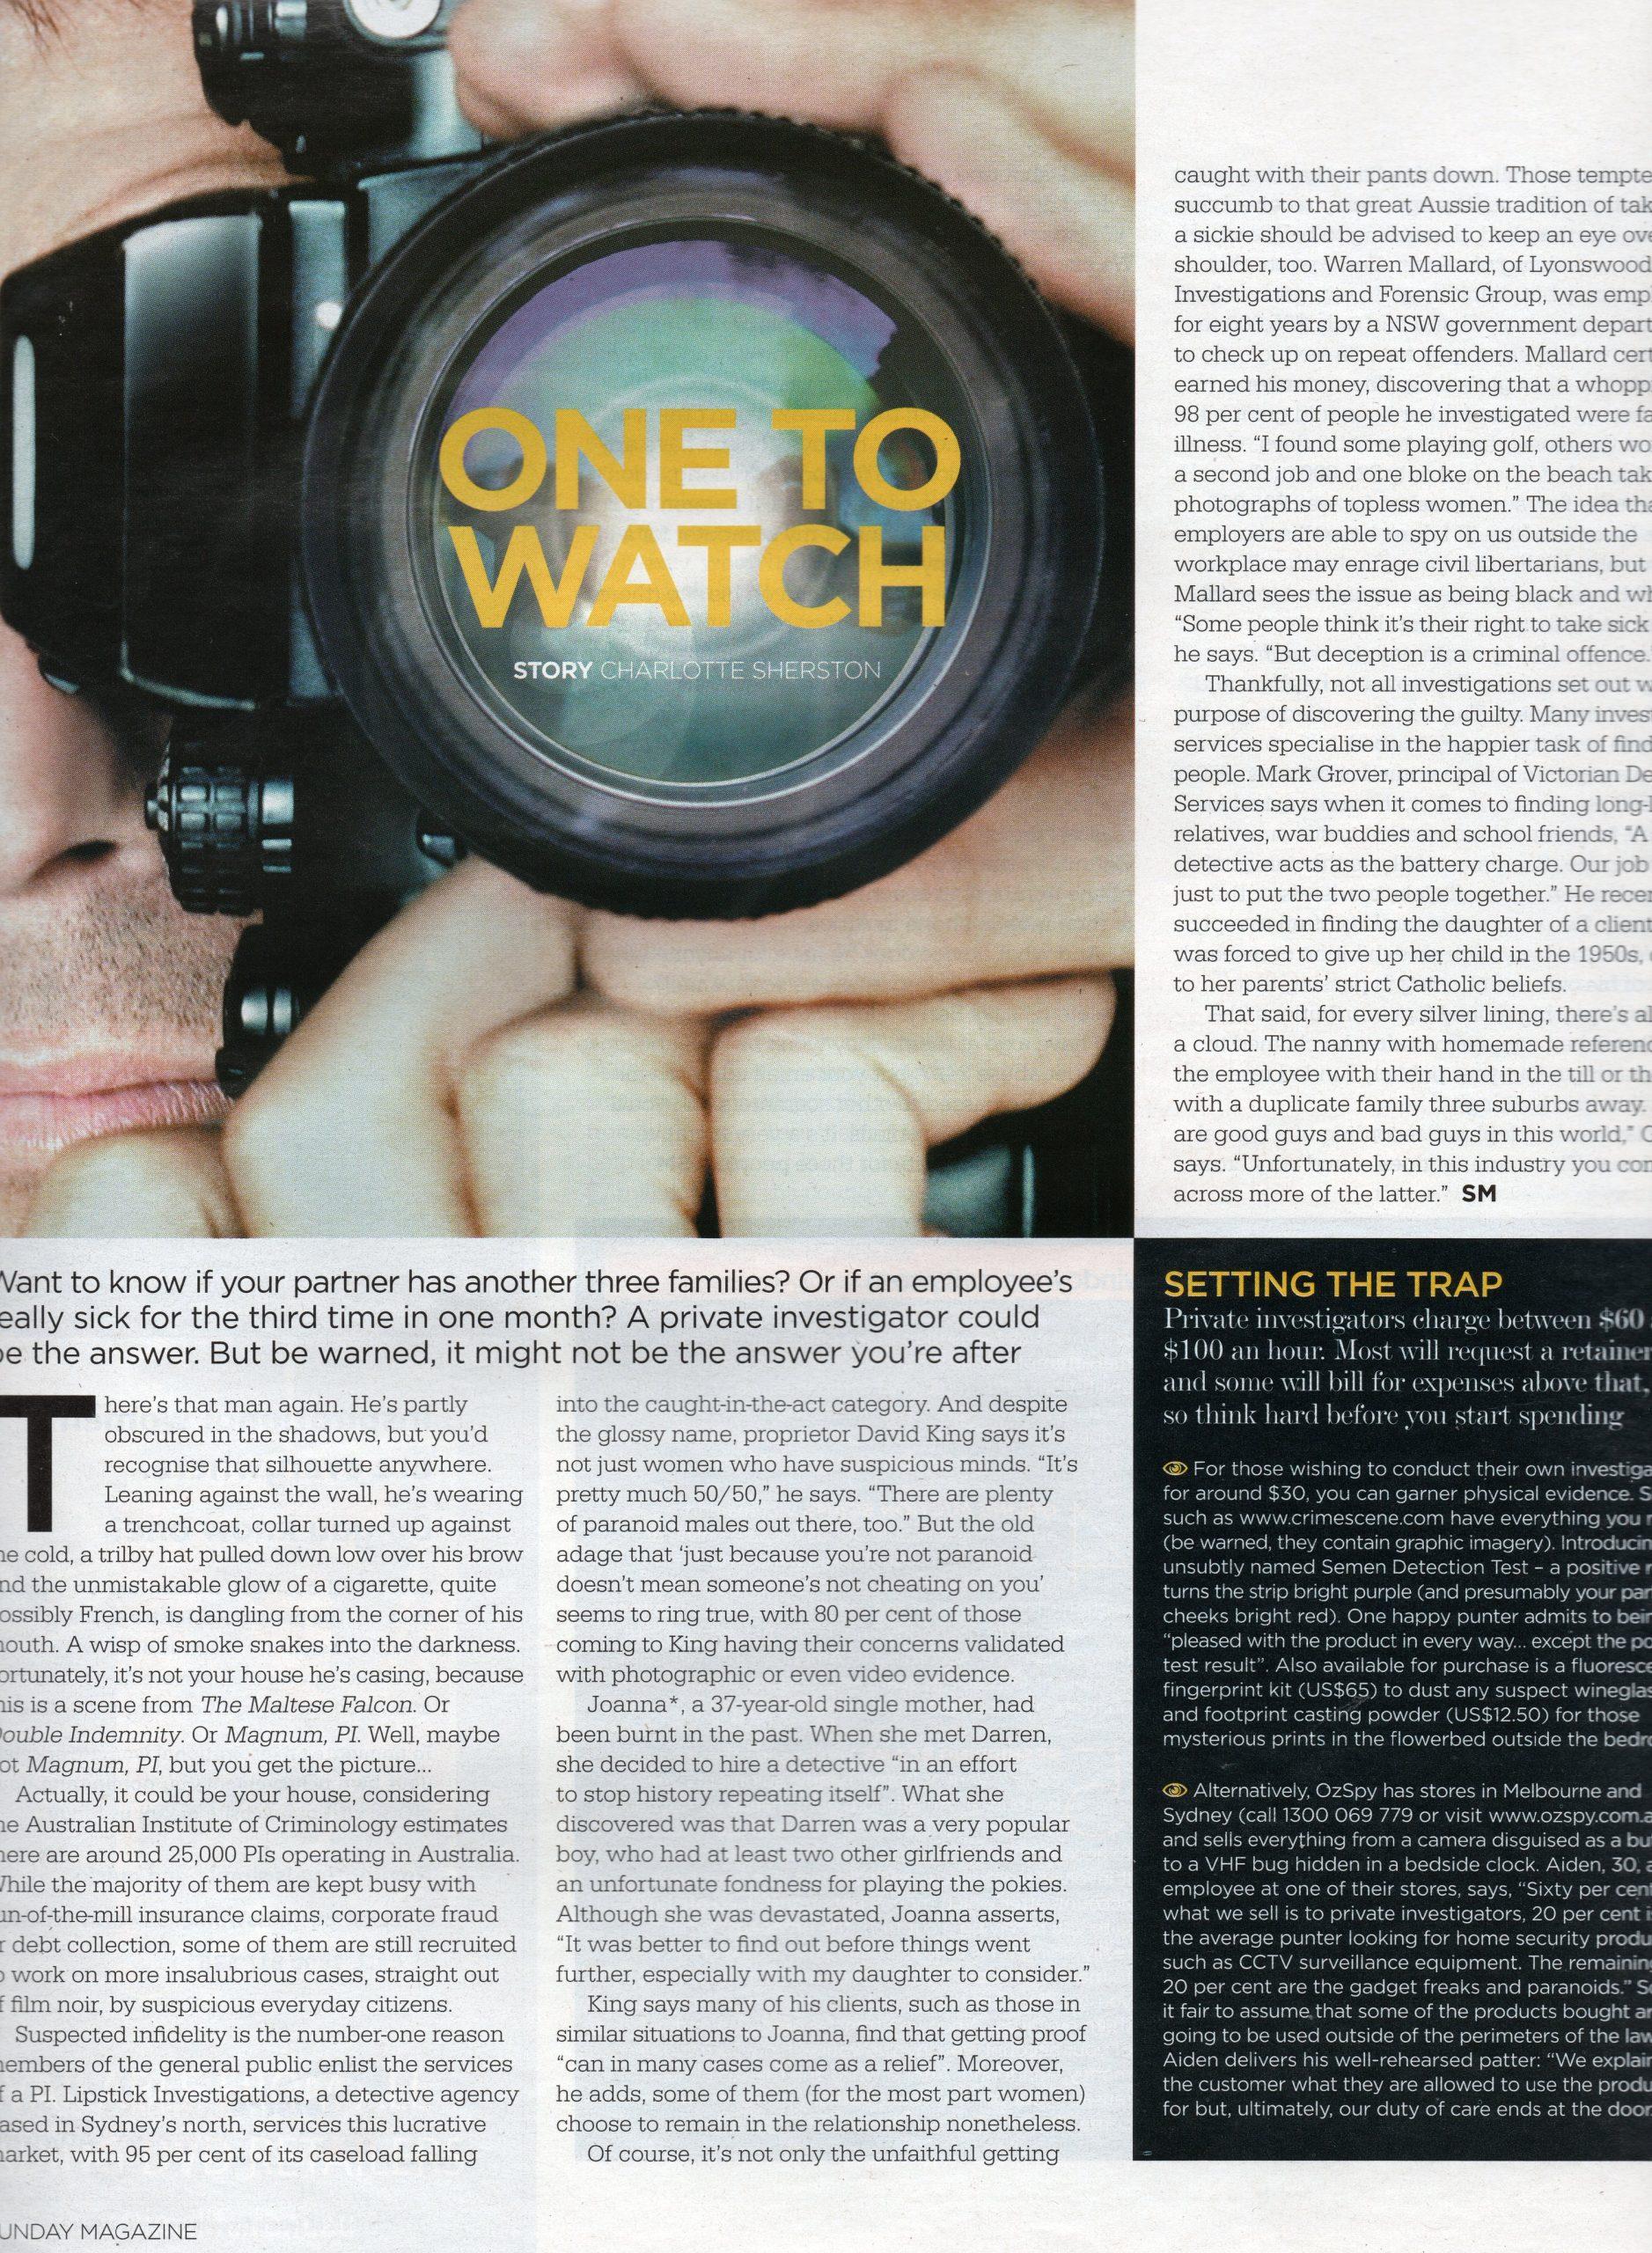 private investigator sydney media